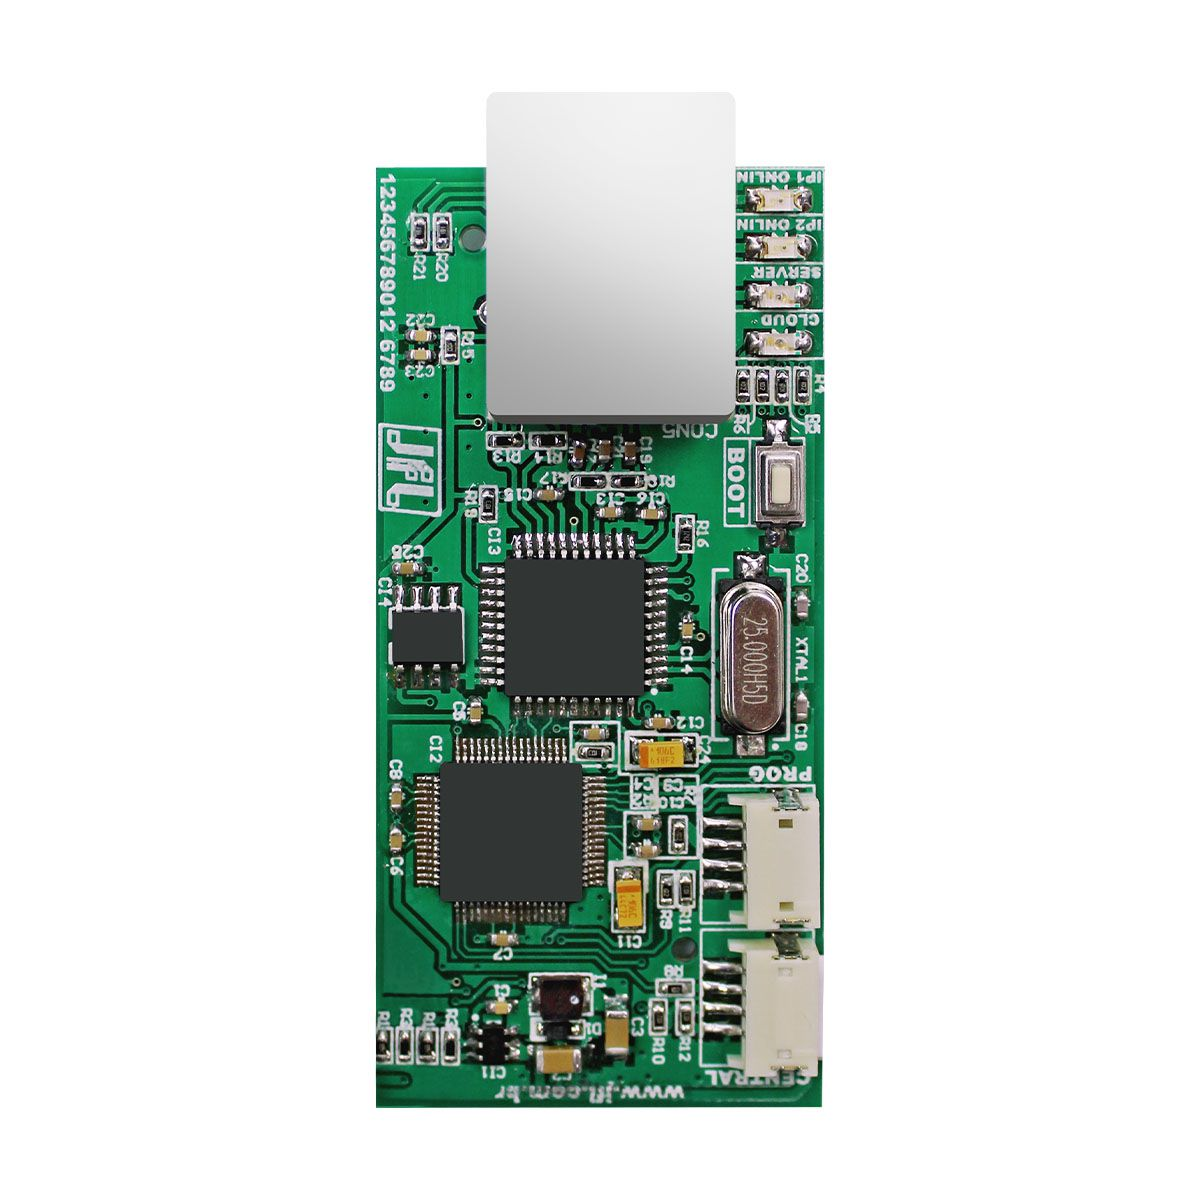 Kit Alarme Smart Cloud 18 Jfl 5 Sensor Pet 30Kg IRD 640